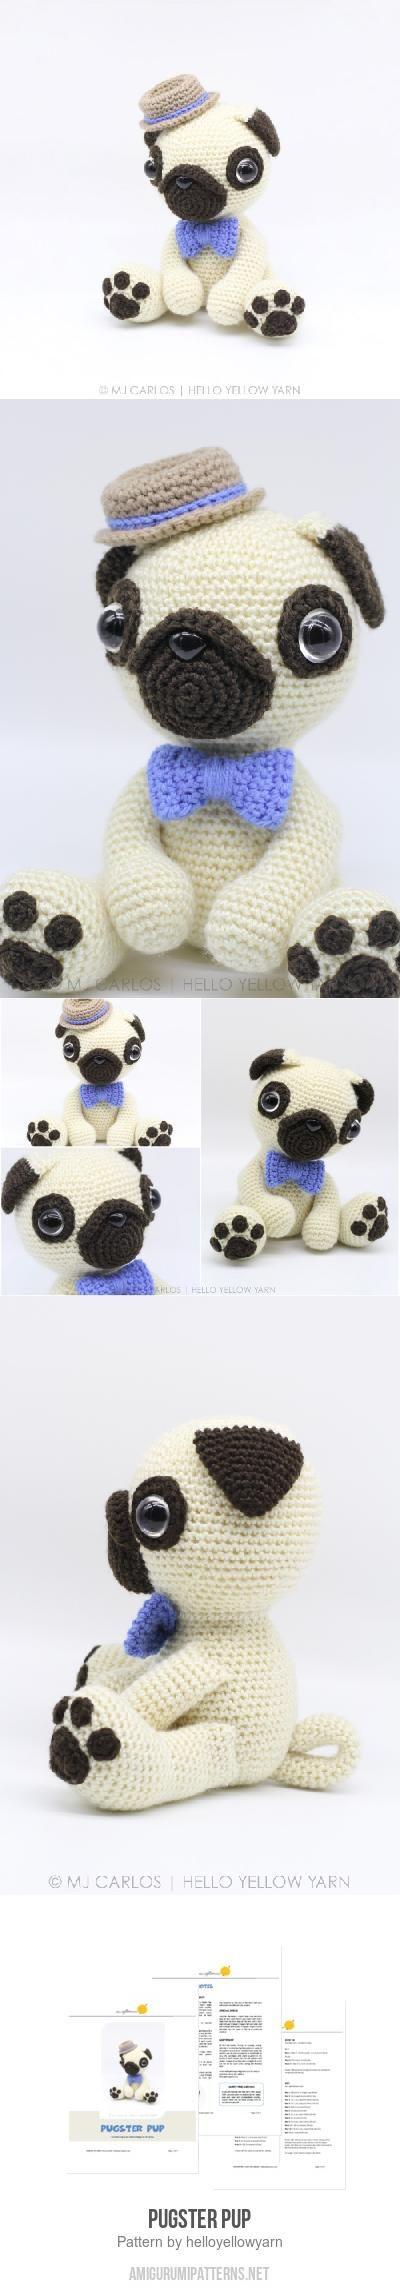 Pugster Pup Amigurumi Pattern